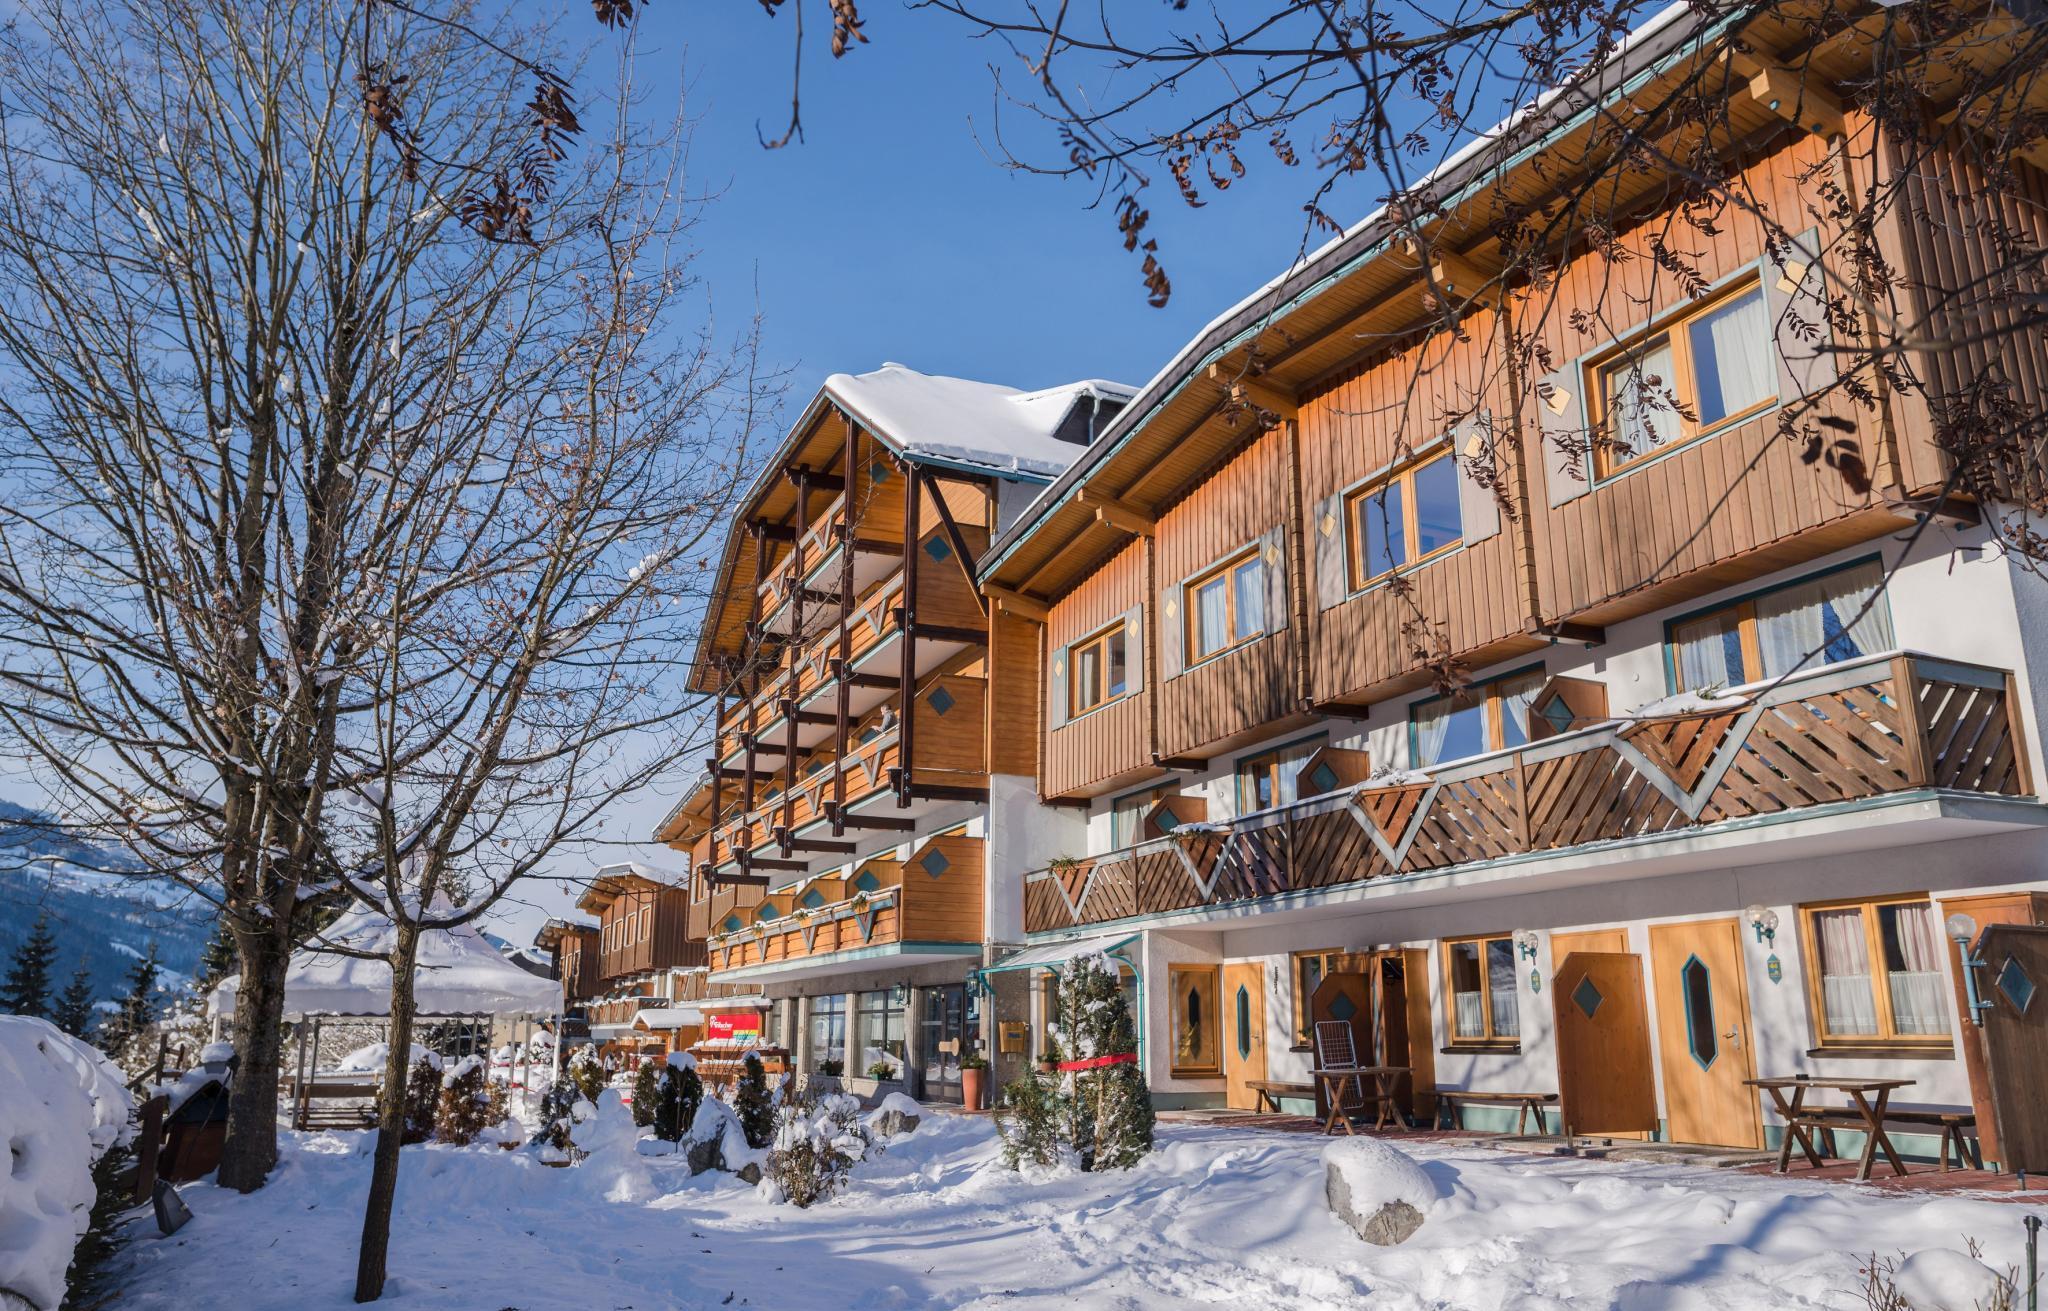 Hotel Ferienalm Salzburgerland